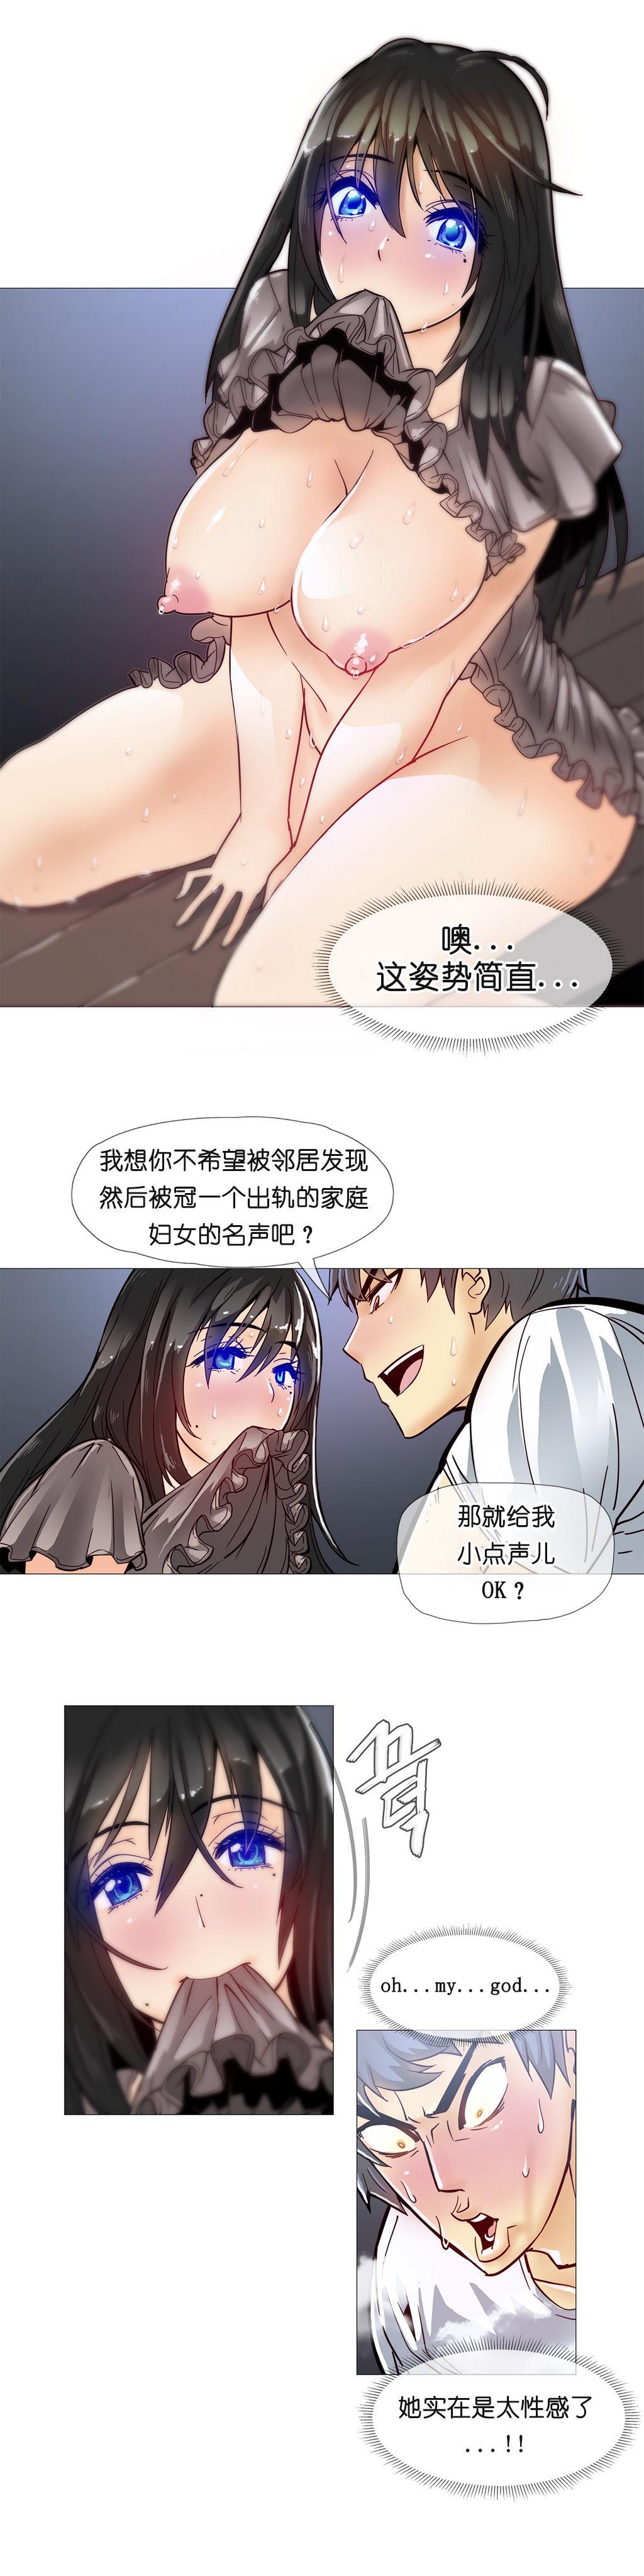 HouseHold Affairs 【卞赤鲤个人汉化】1~21话(持续更新中) 185